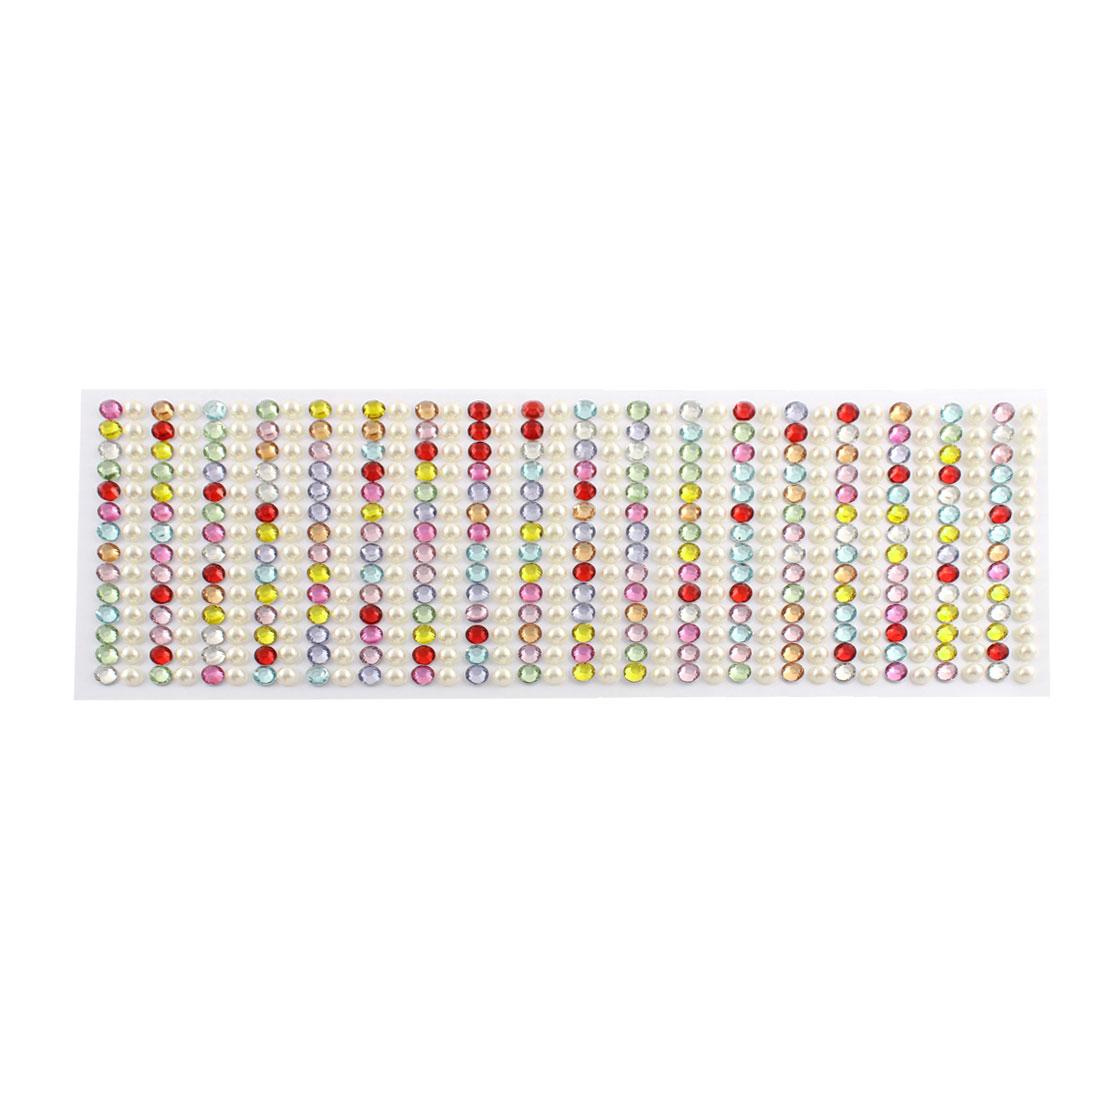 Multicolor Self Adhesive Bling Crystal Rhinestone Decorating DIY Stickers 255mm x 90mm